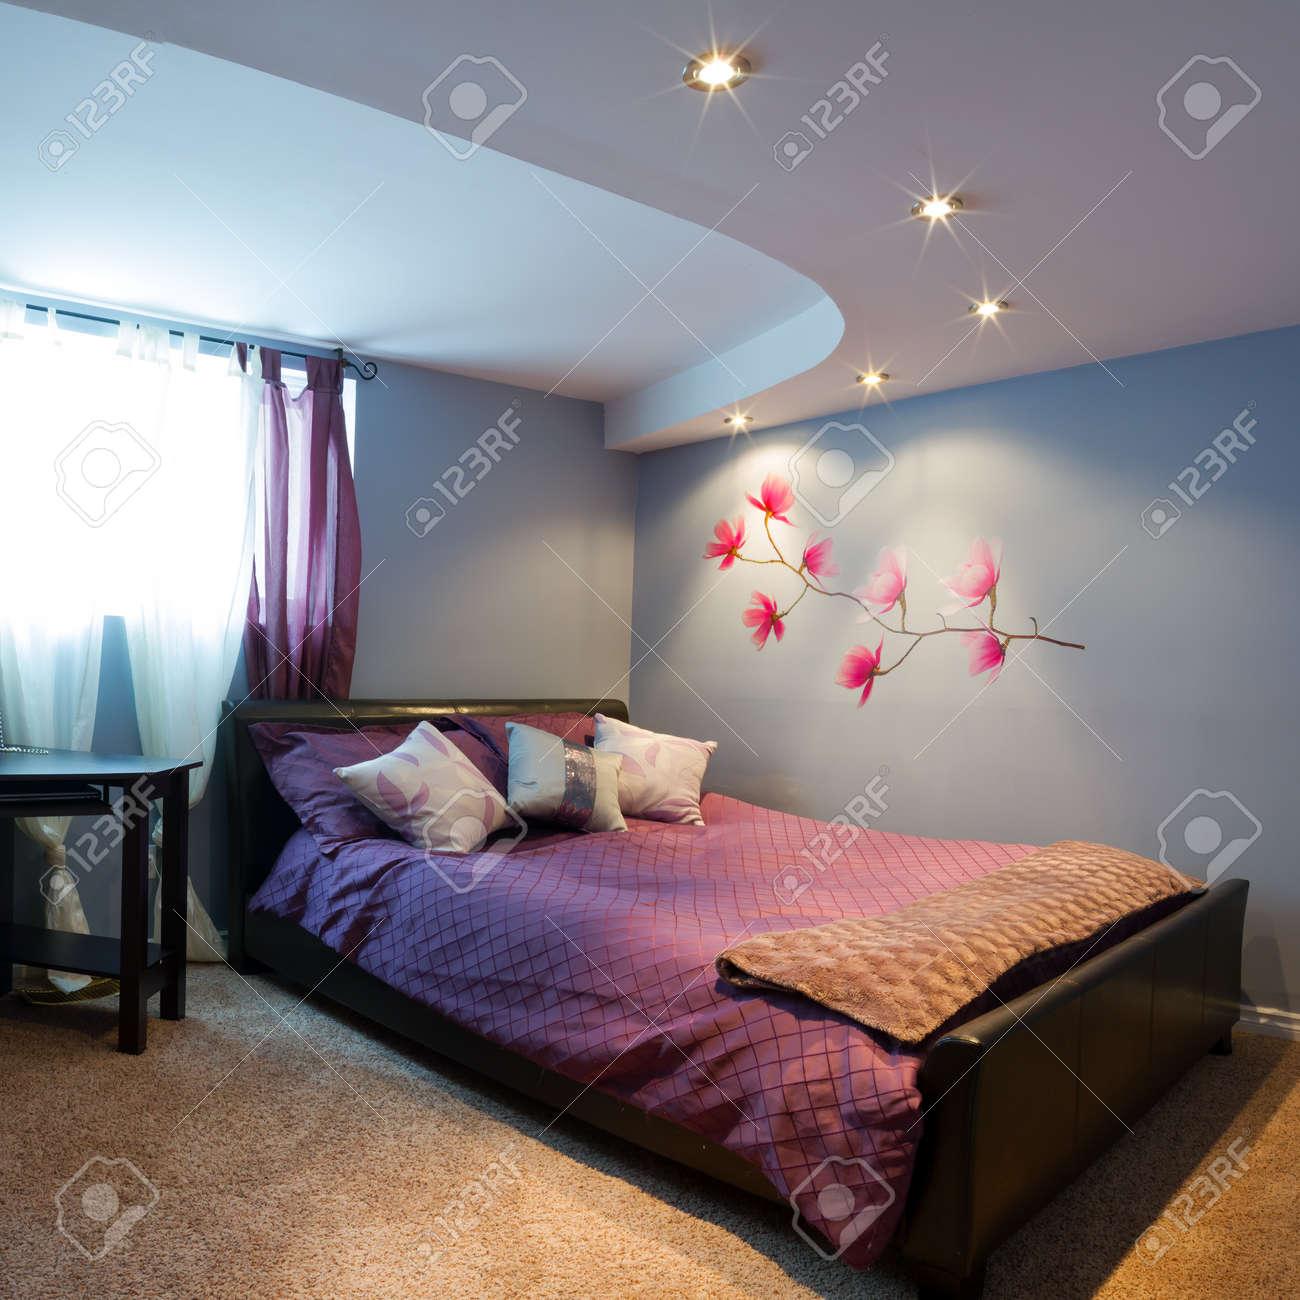 Sovrum med inredning i ett nytt hus. royalty fria stockfoton ...